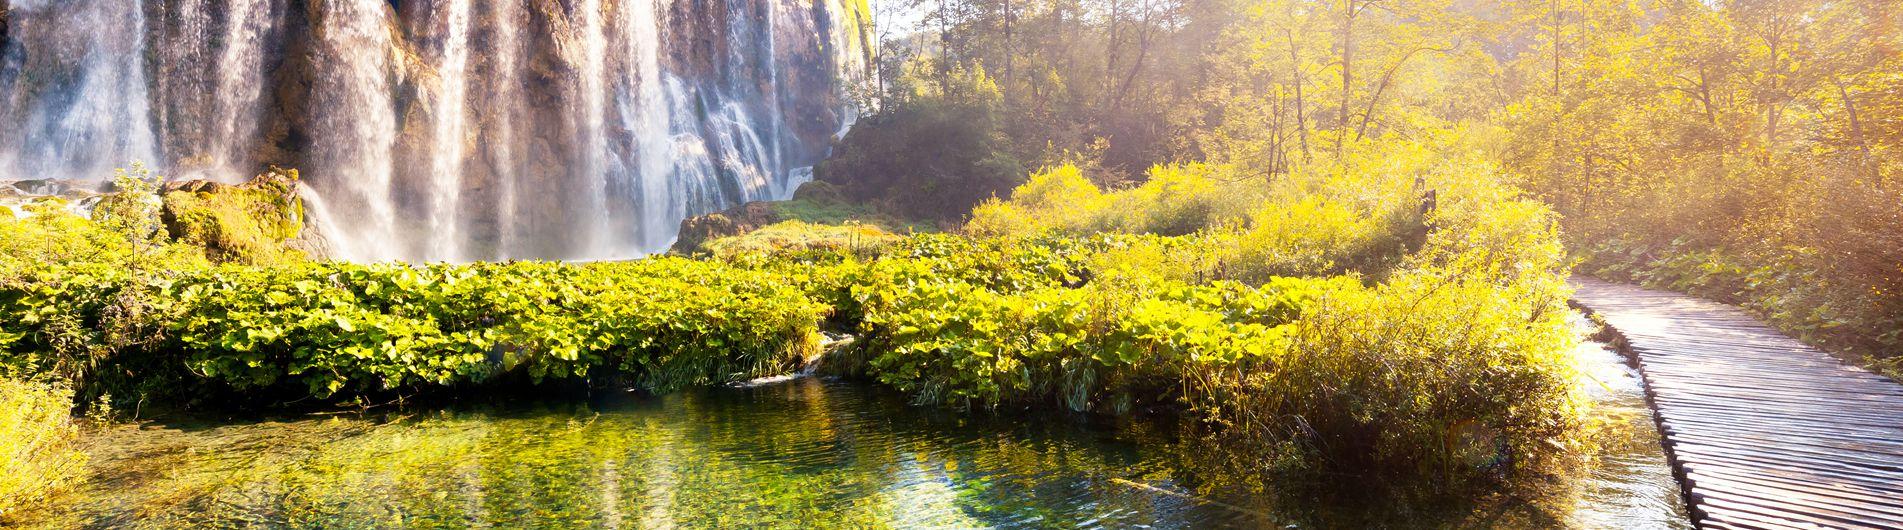 Plitvicka Jezera Holidays